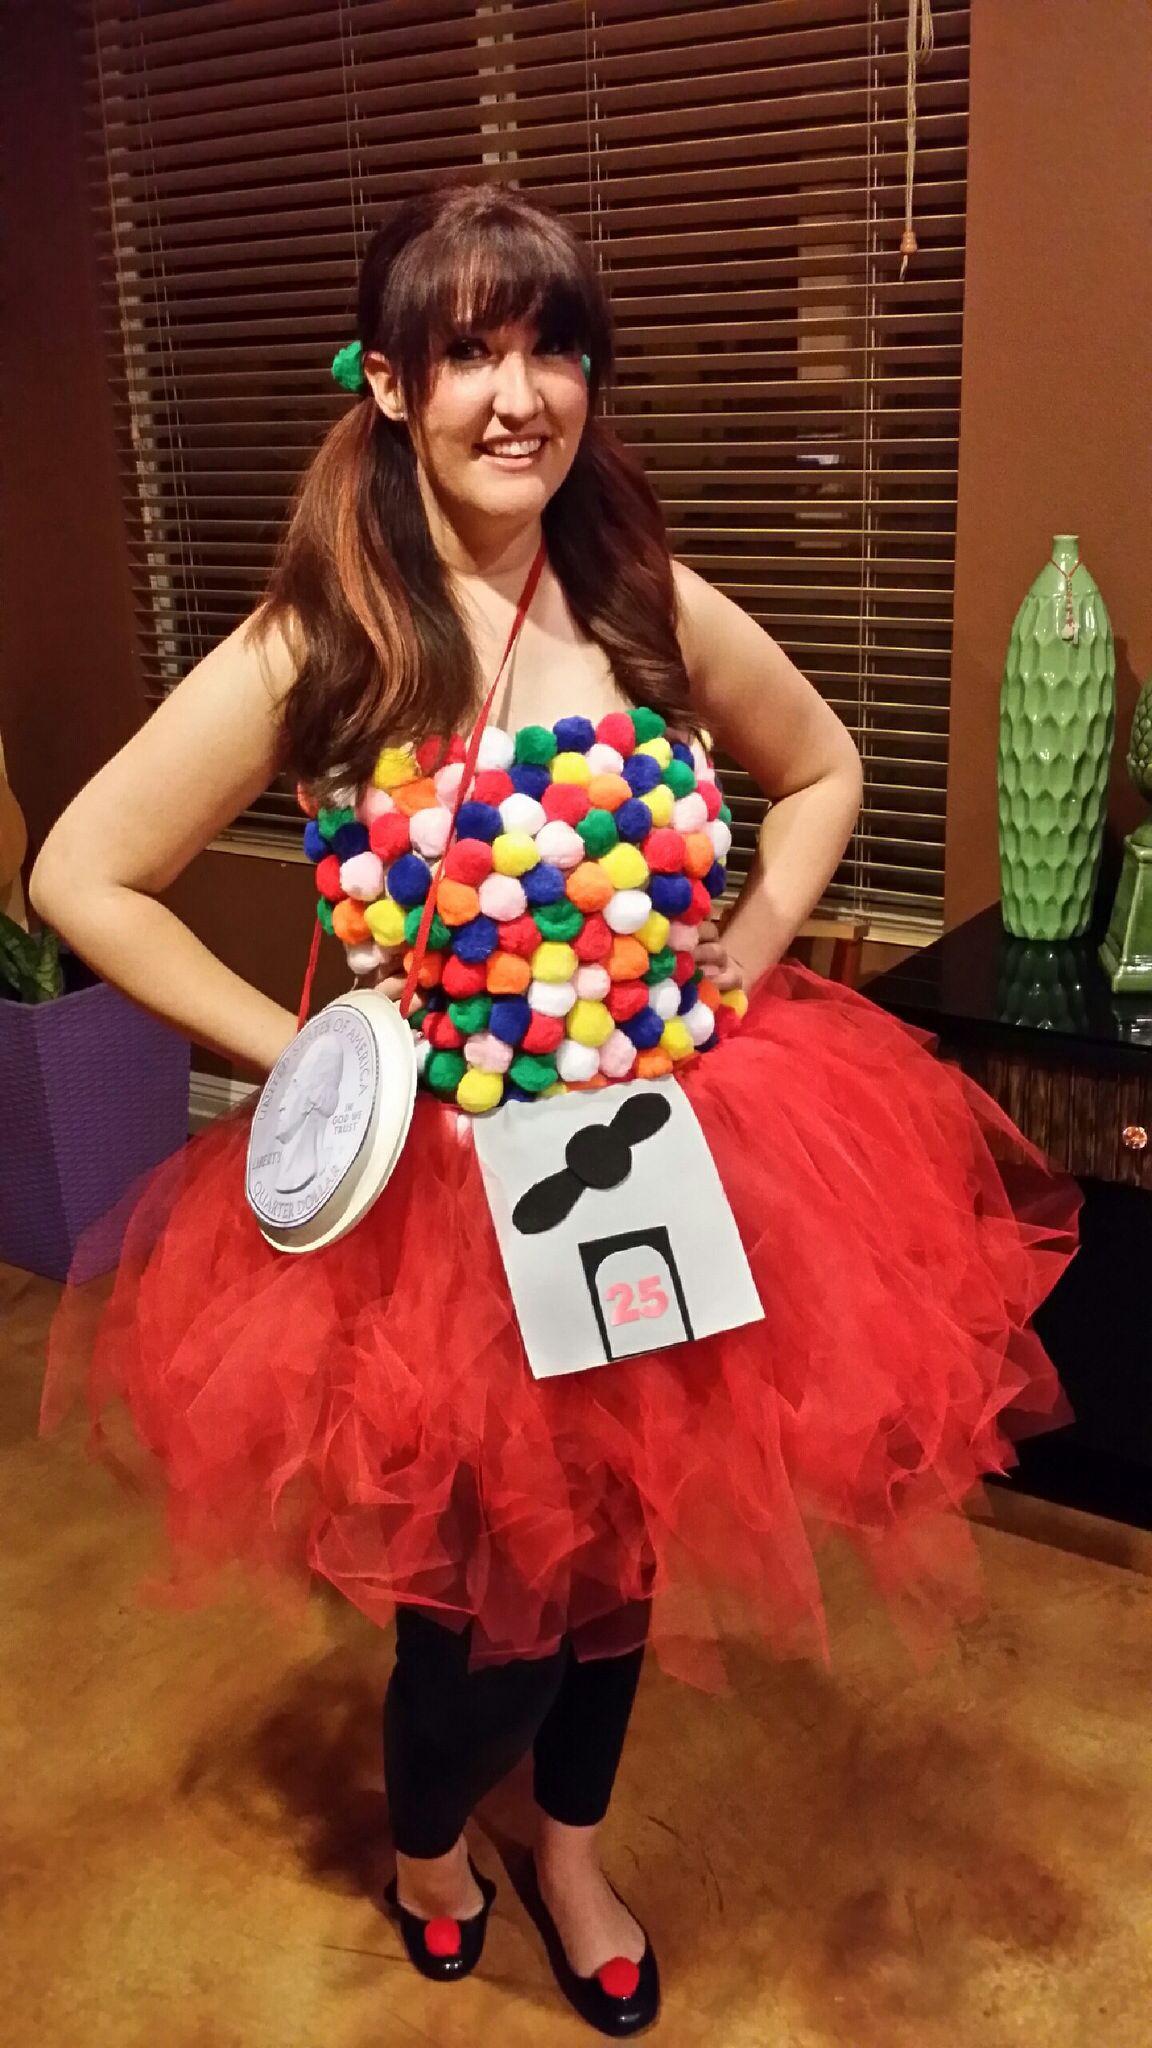 Diy Halloween Kostüm  DIY Halloween Costume Gumball Machine